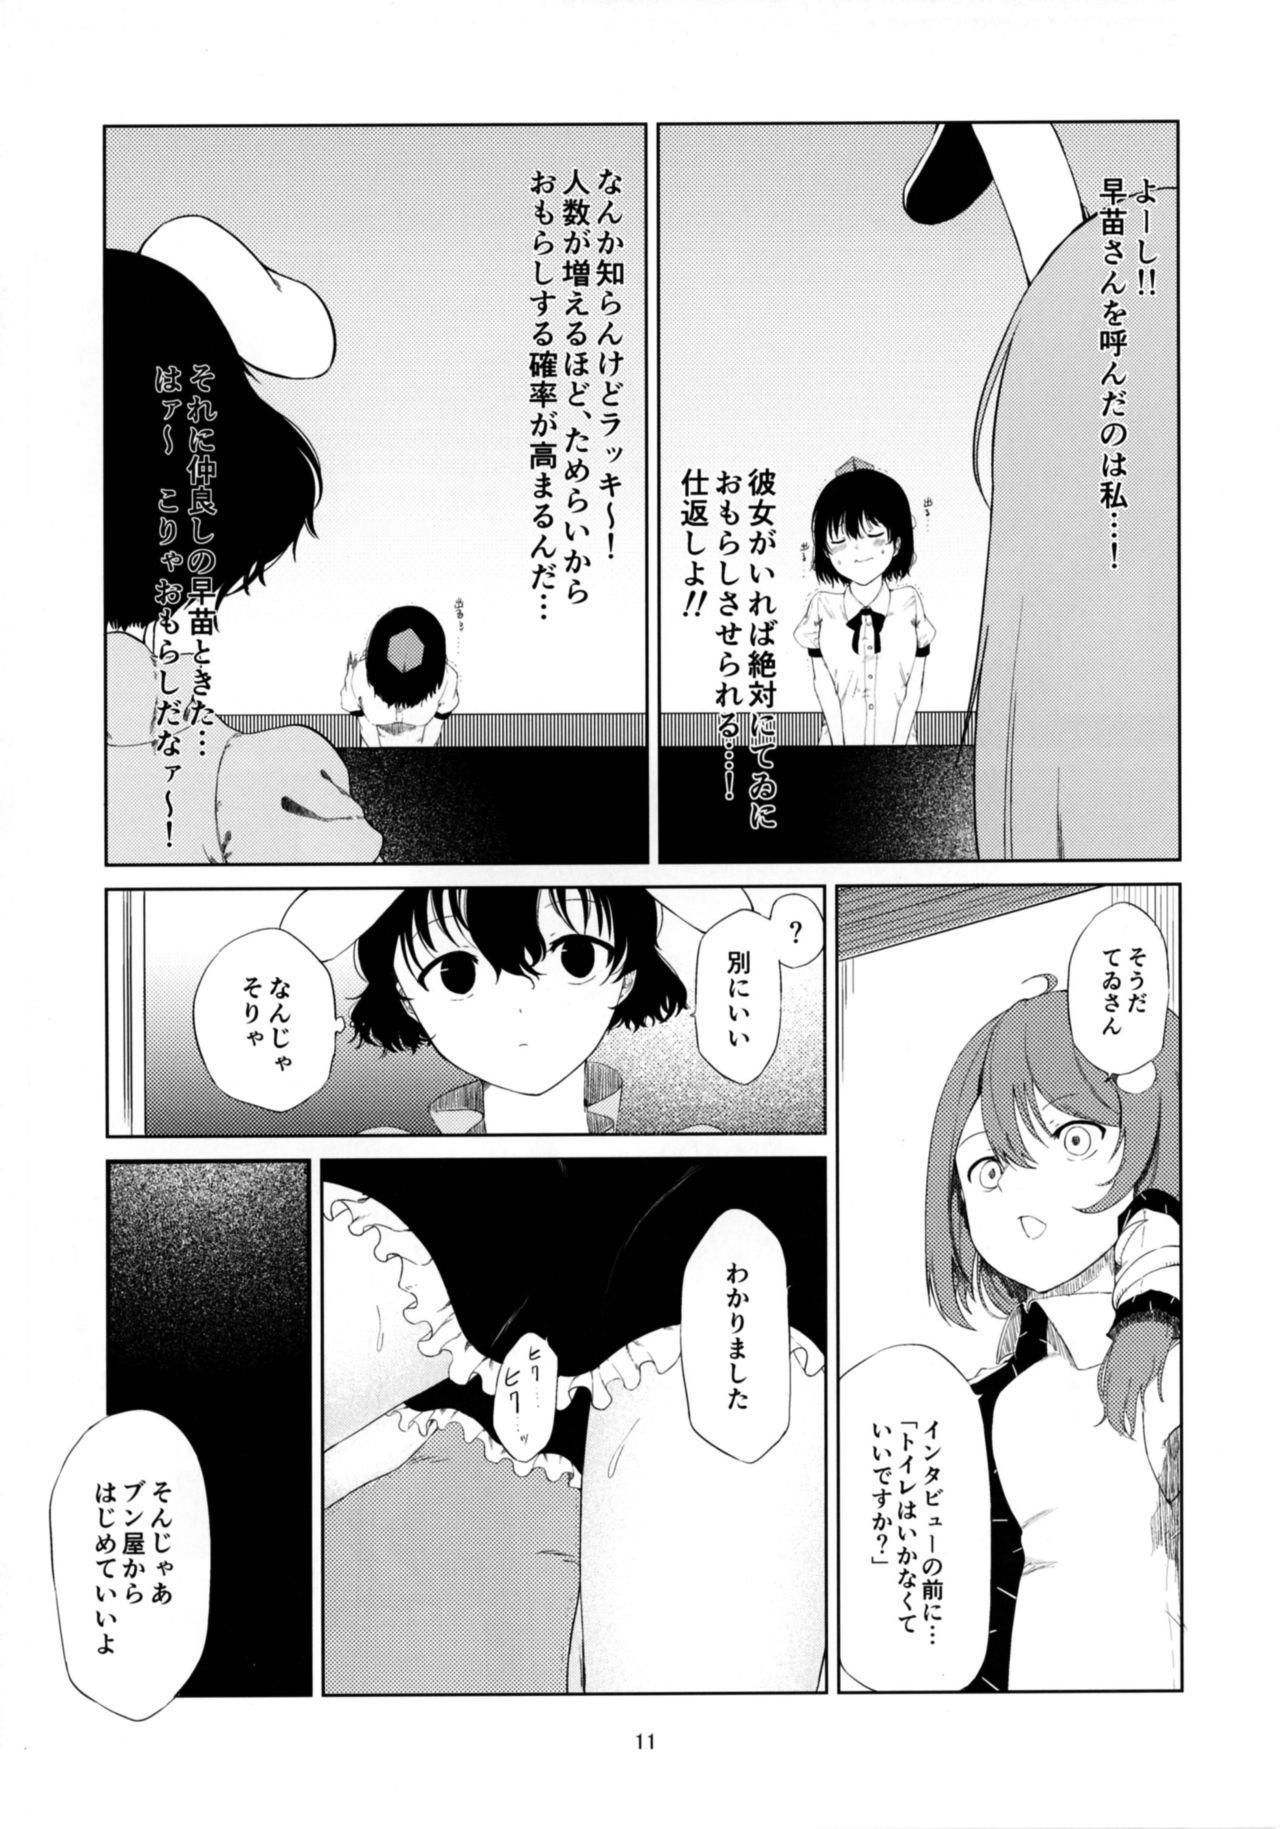 Aya to Tewi to Sanae to Udonge ga Omorashi Suru Hon!! 10